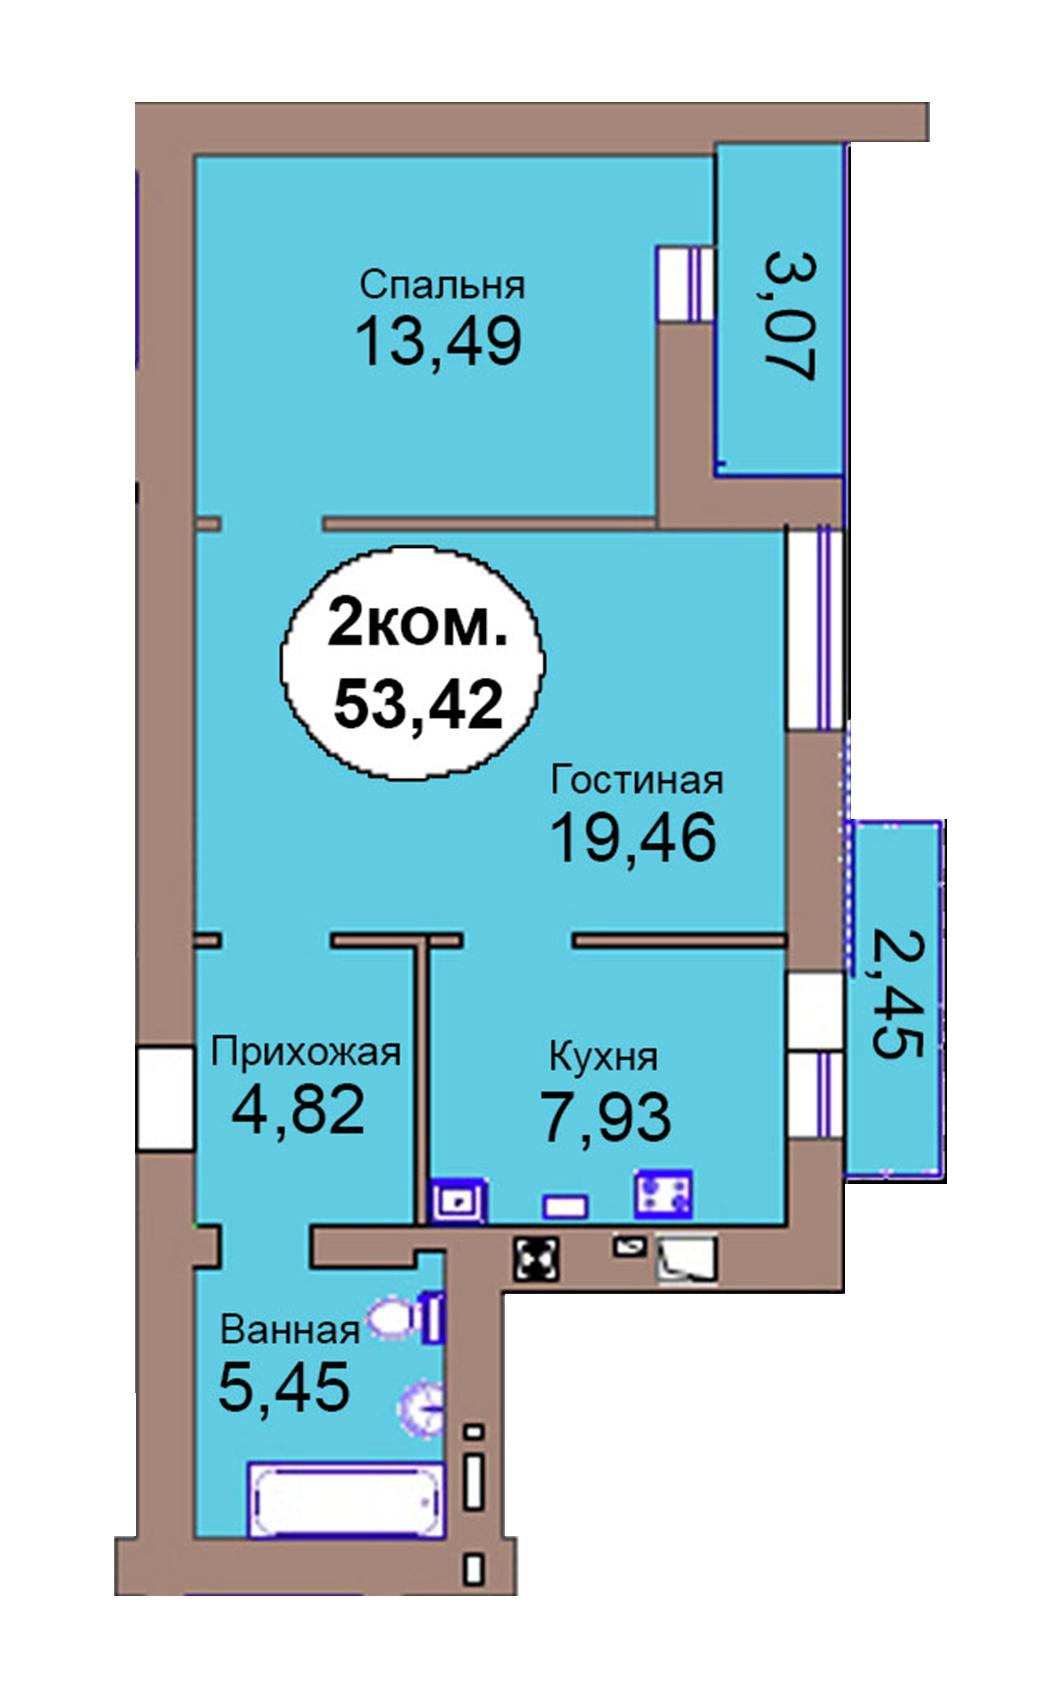 2-комн. кв. по пер. Калининградский, 4  кв. 114 в Калининграде